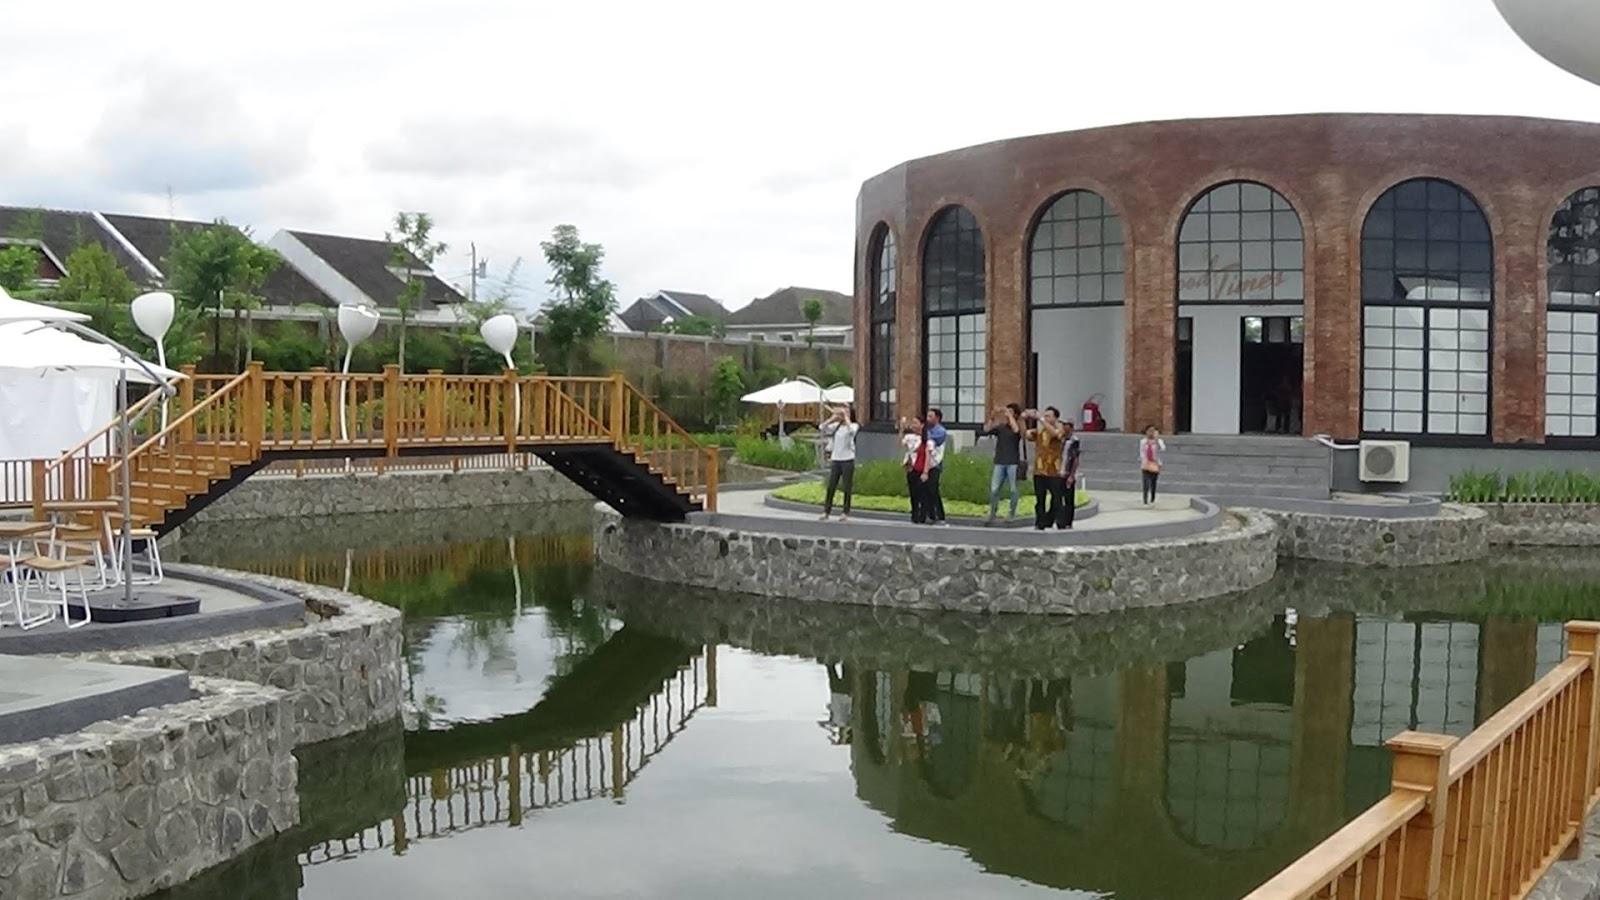 Wisata Pendidikan Village Purwokerto Destinasi Kecamatan Baturraden Rempoah Baturaden Mandala